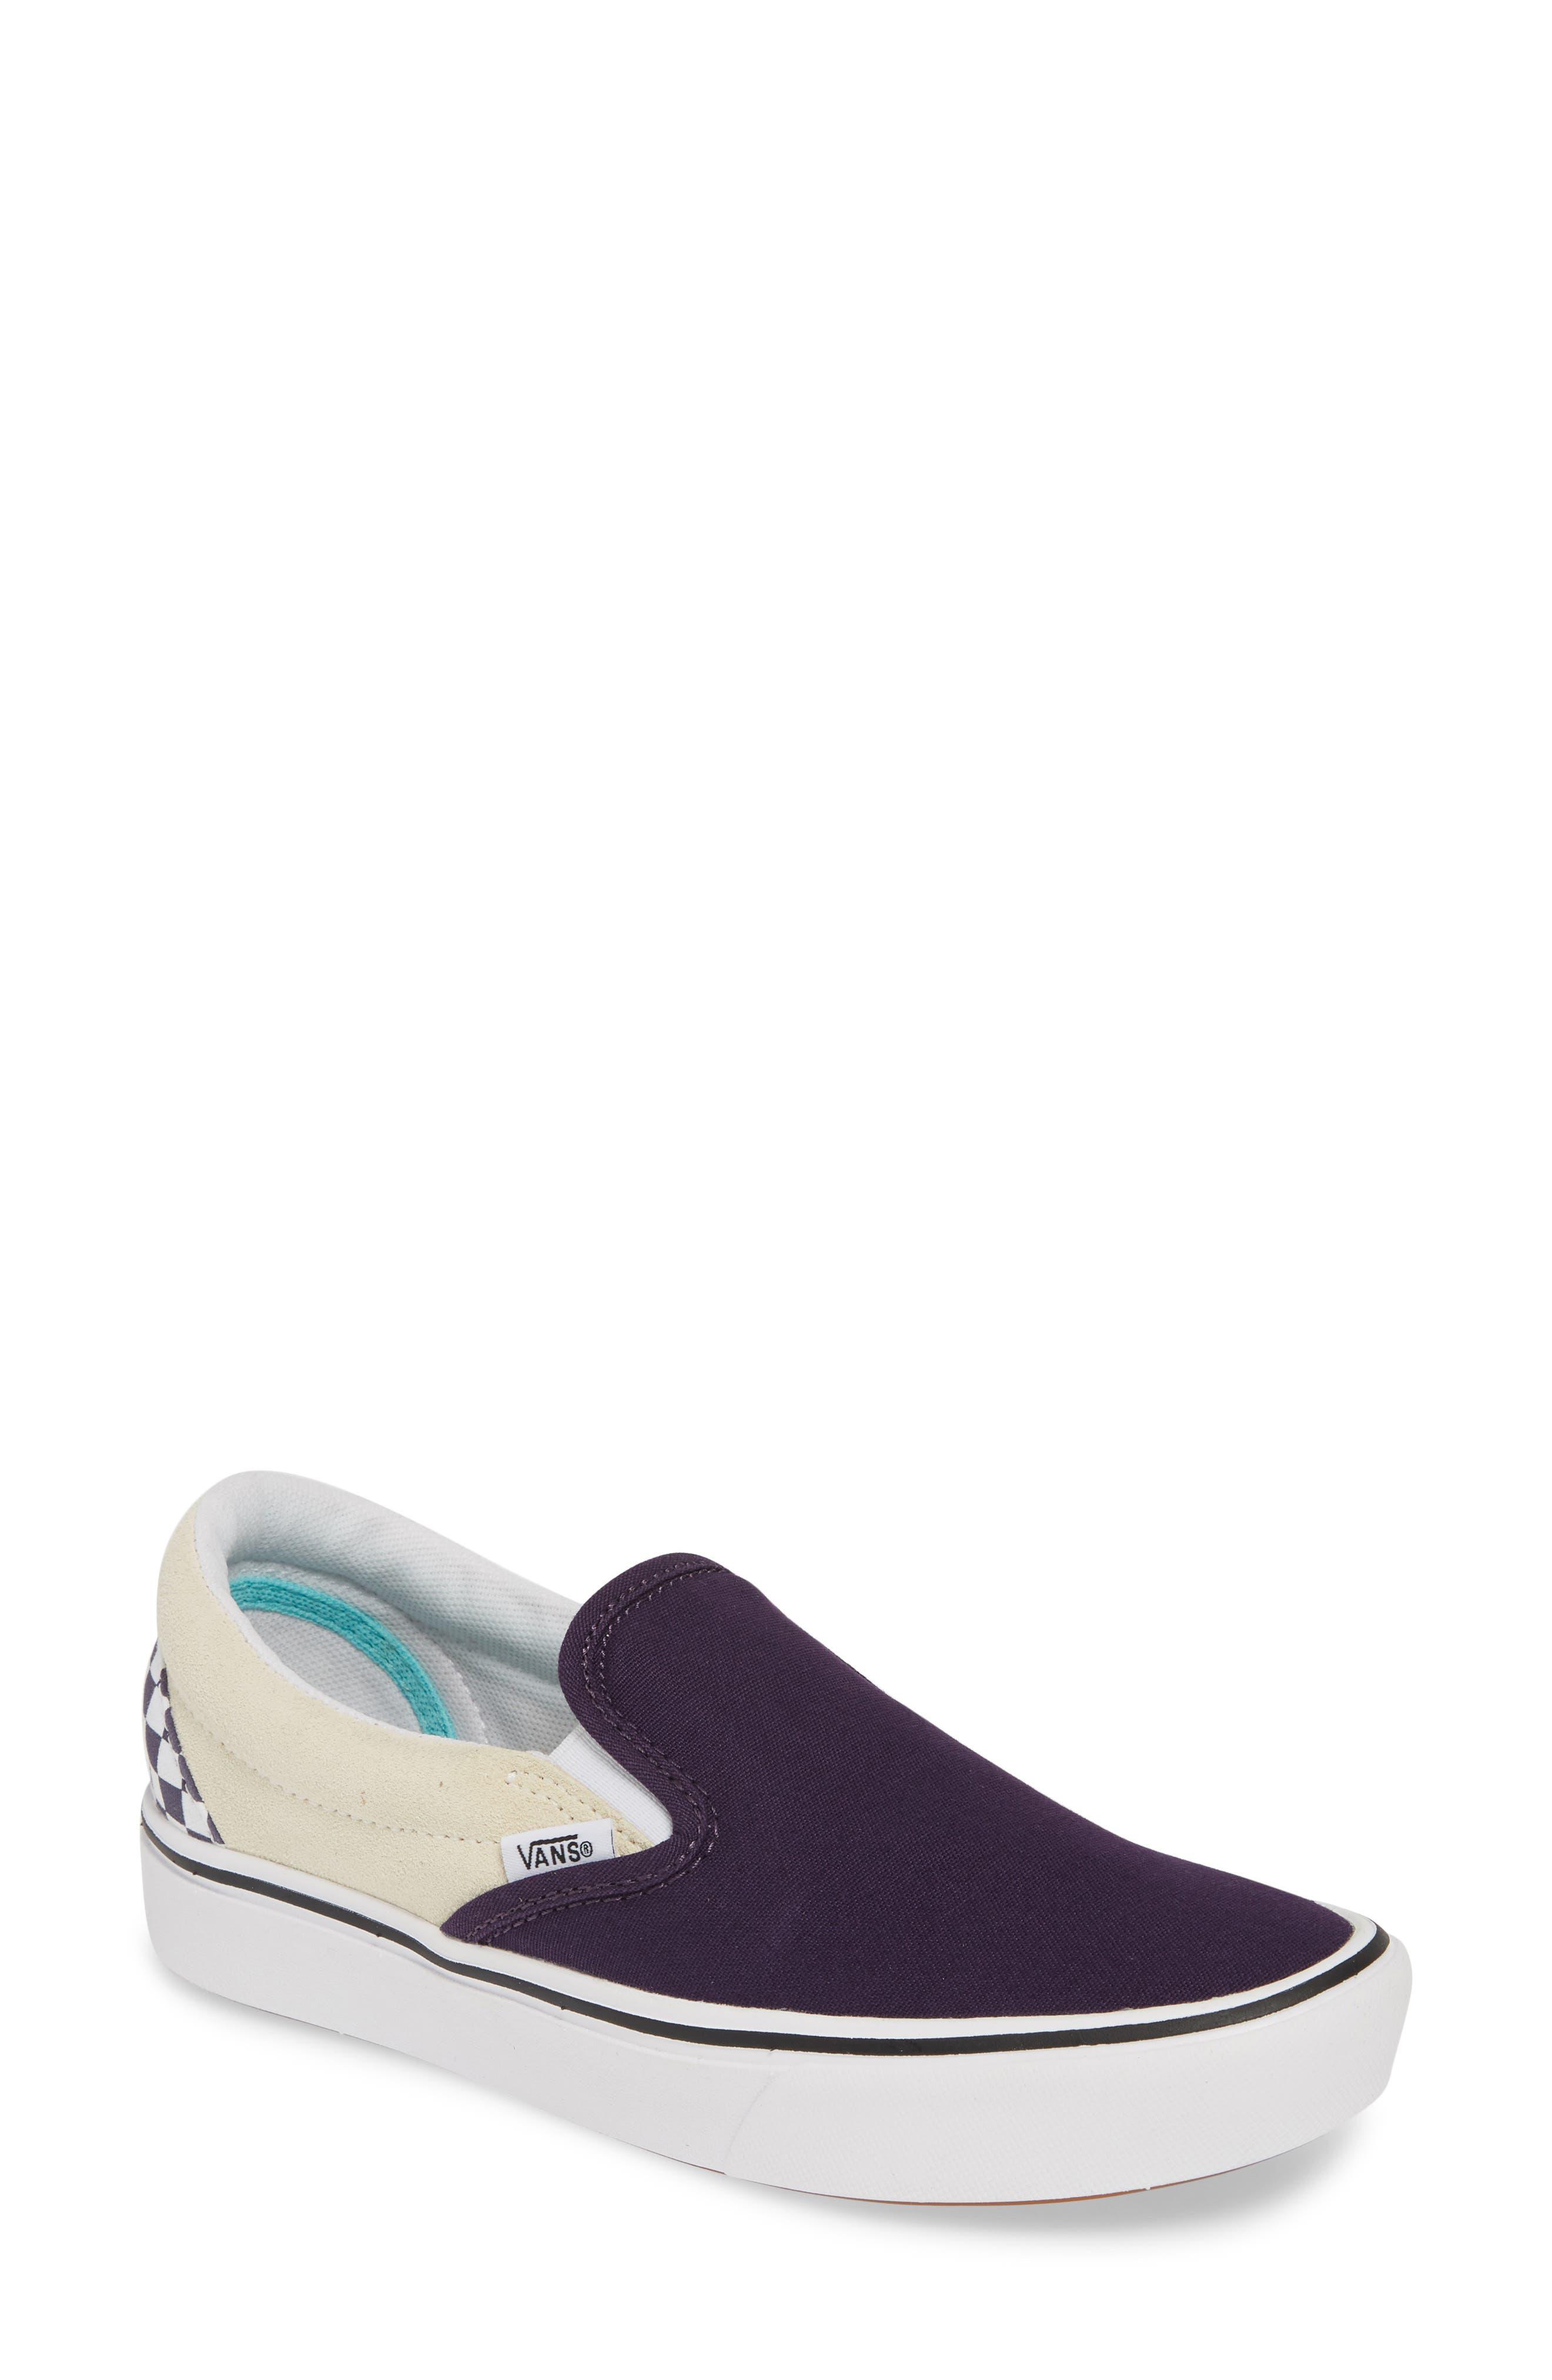 Vans Comfycush Colorblock Slip-On Sneaker- Blue